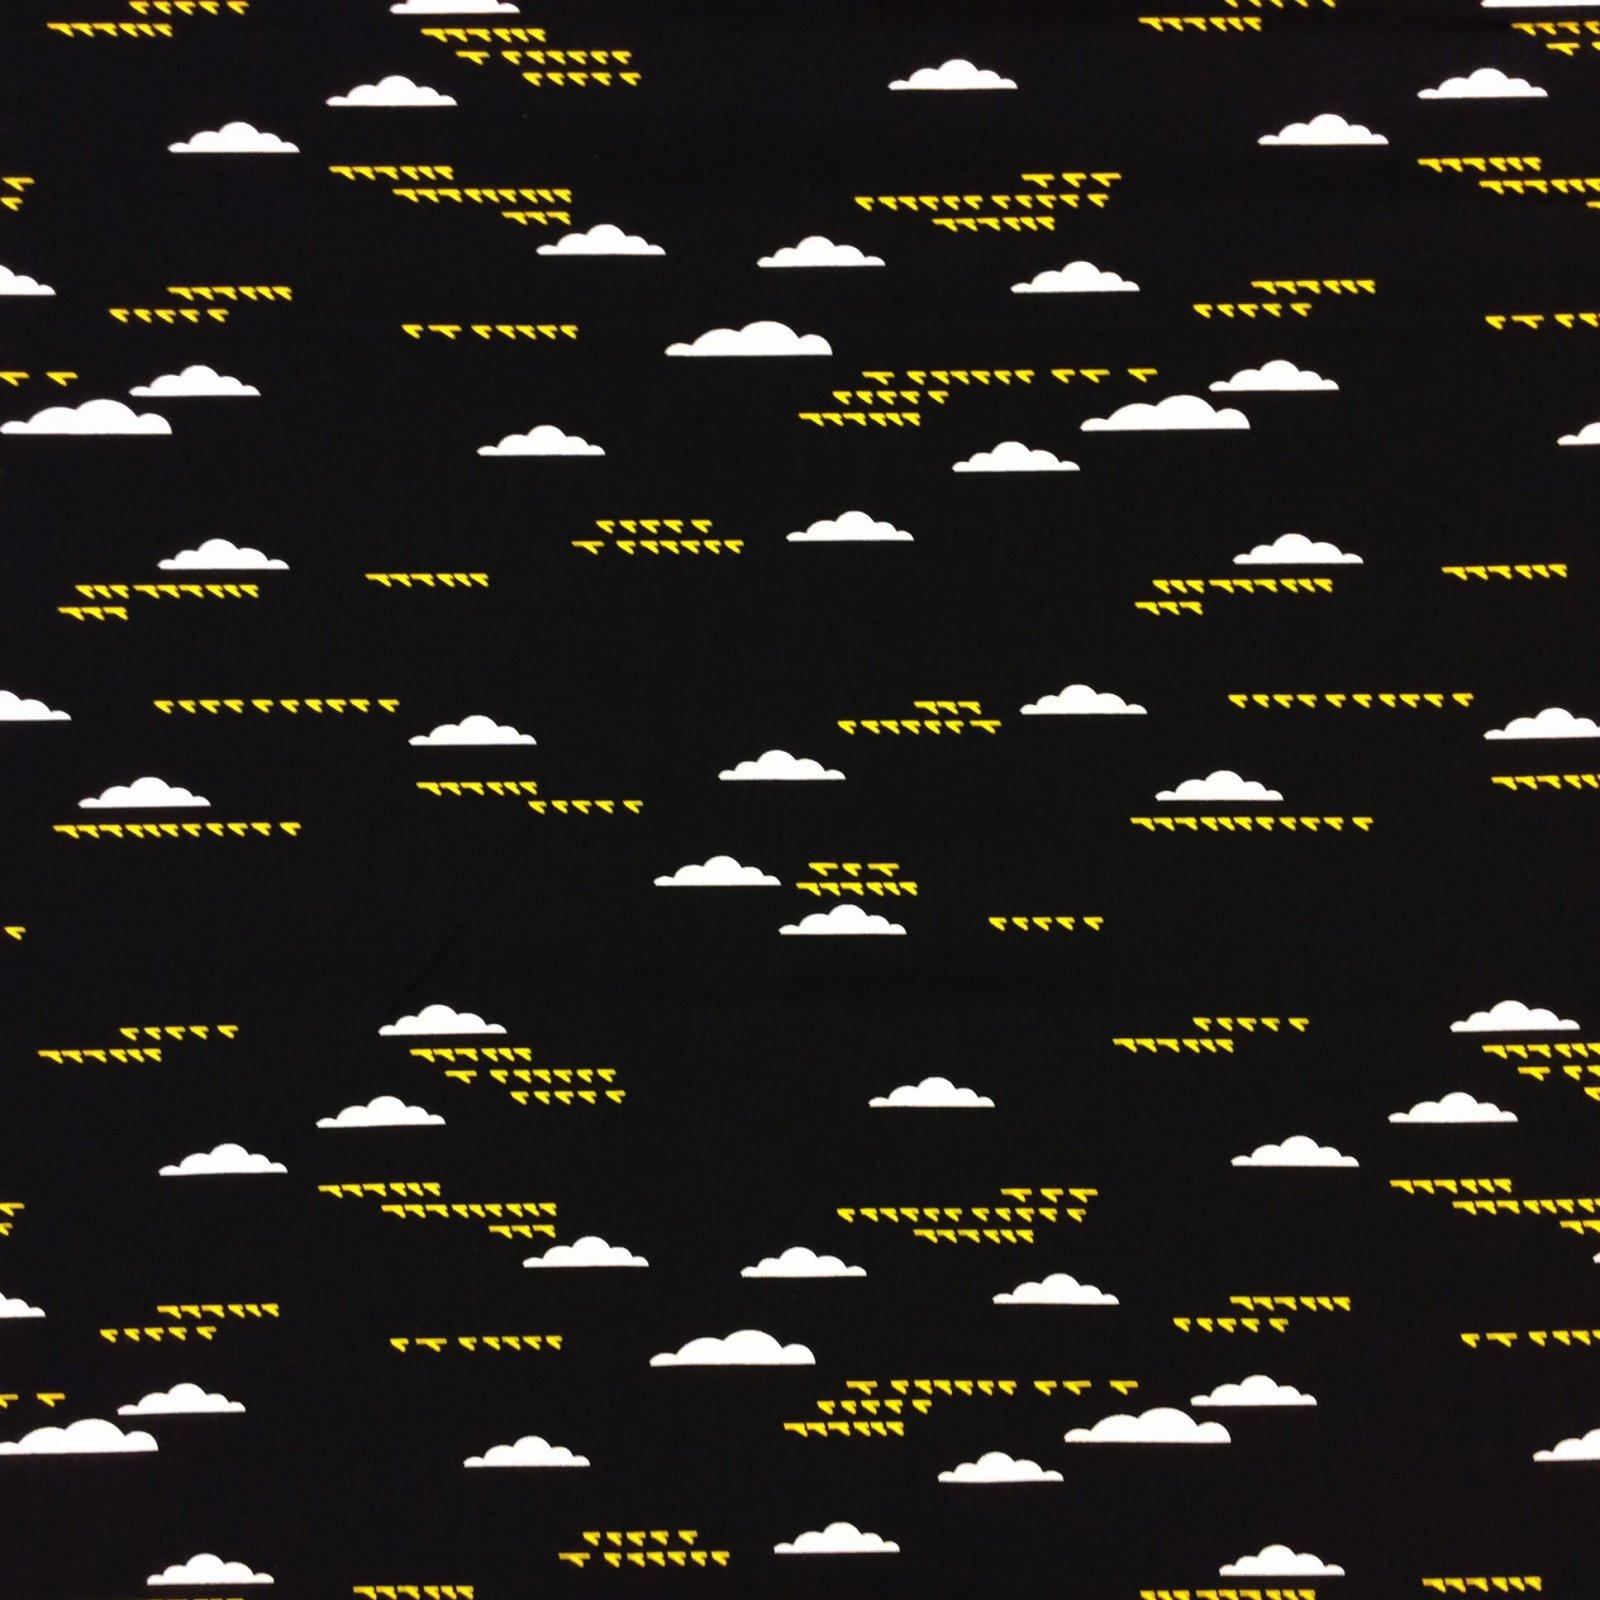 Charley Harper Clouds & Birds Fly Sky Bird Organic Cotton Quilt Fabric Fabric CHB41